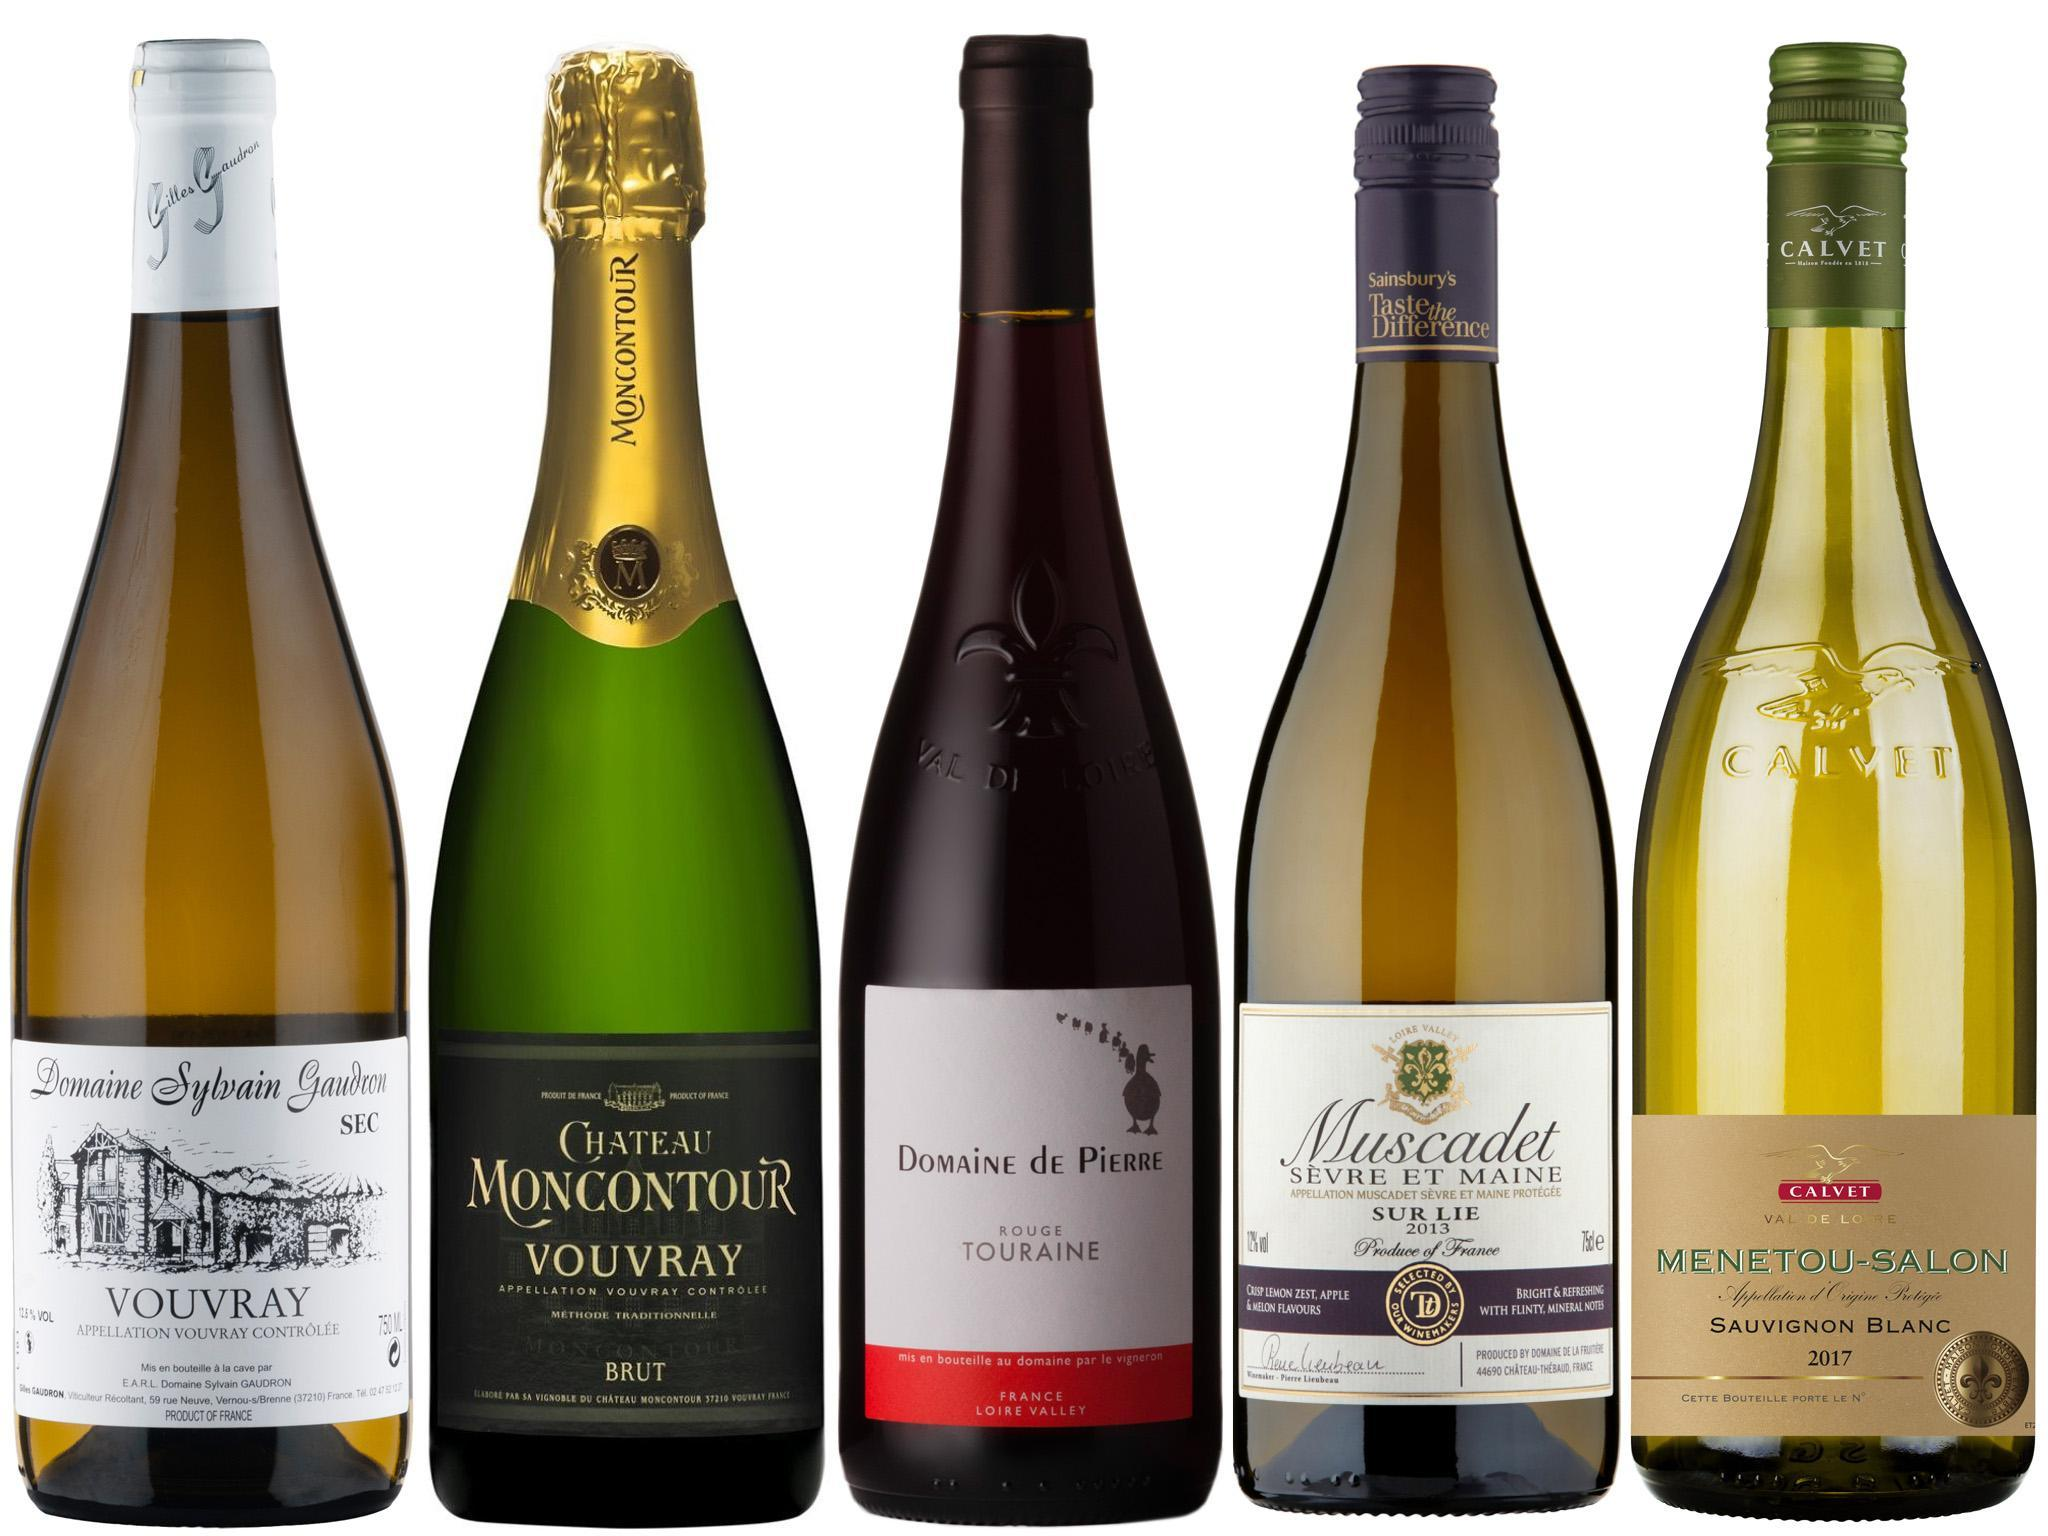 Salon Rouge Blanc Noir wines of the week: 10 bottles from the loire region | the